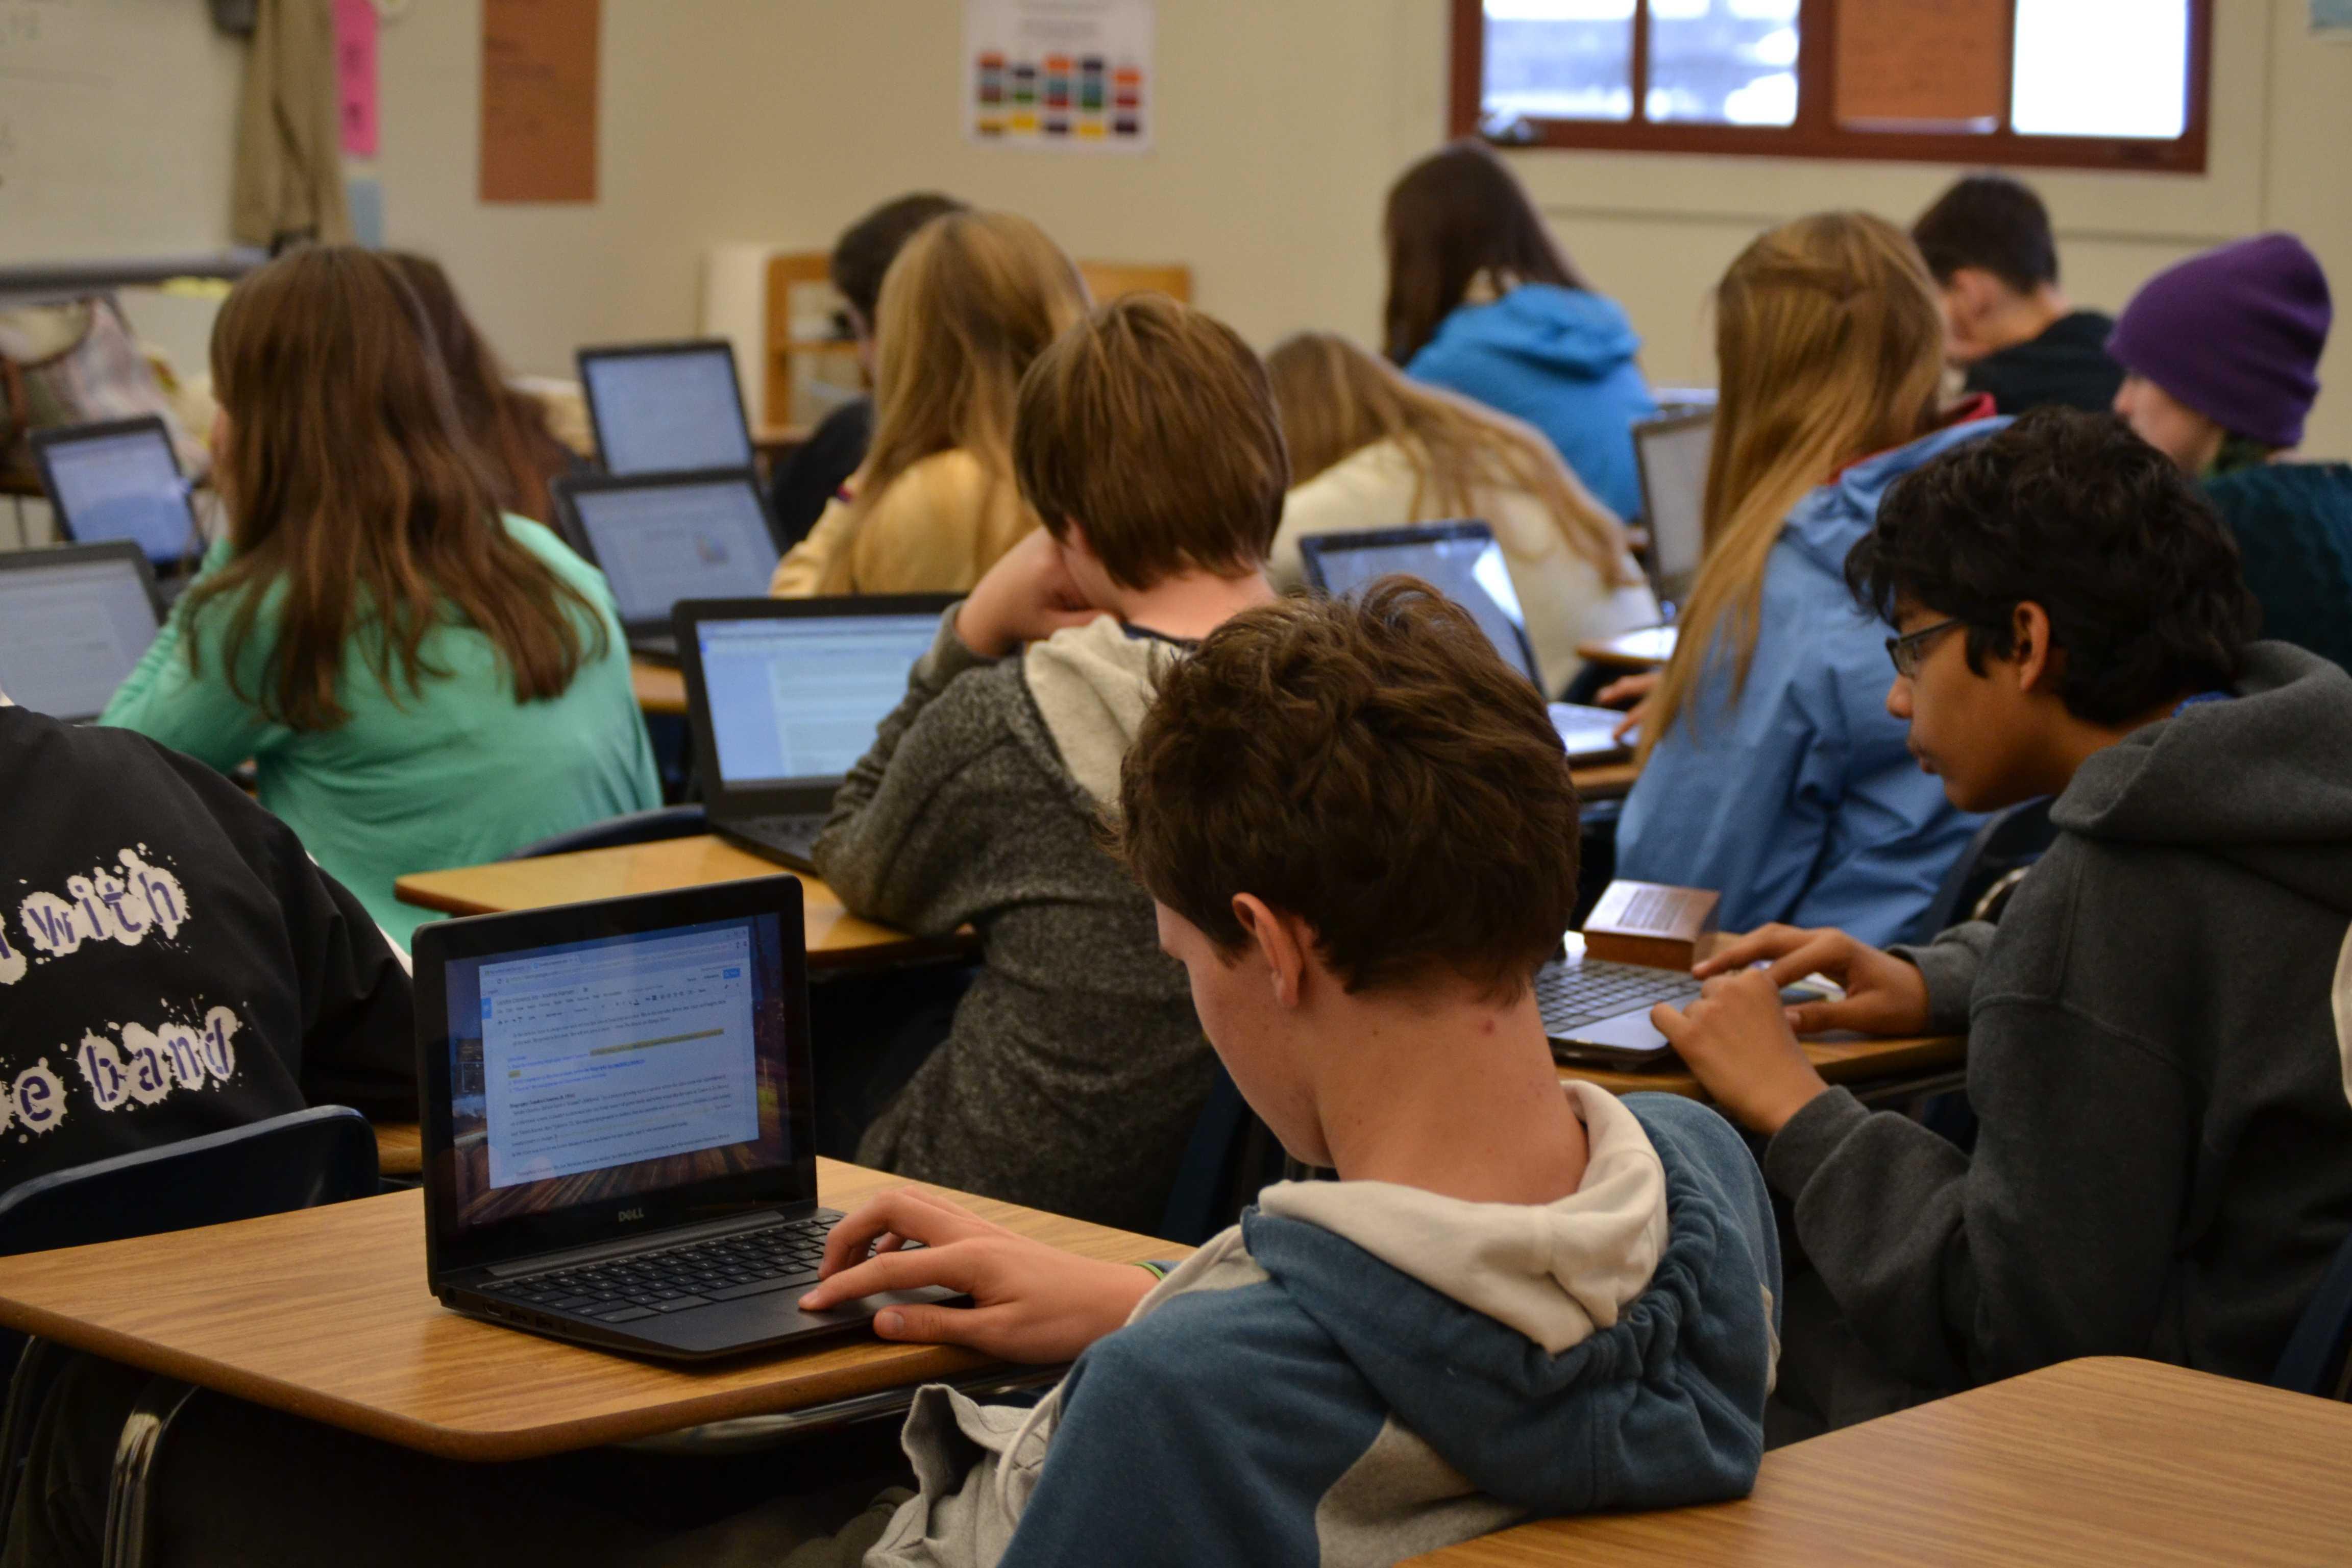 Chromebooks Put New Shine On Classroom Experience | The Piedmont ...